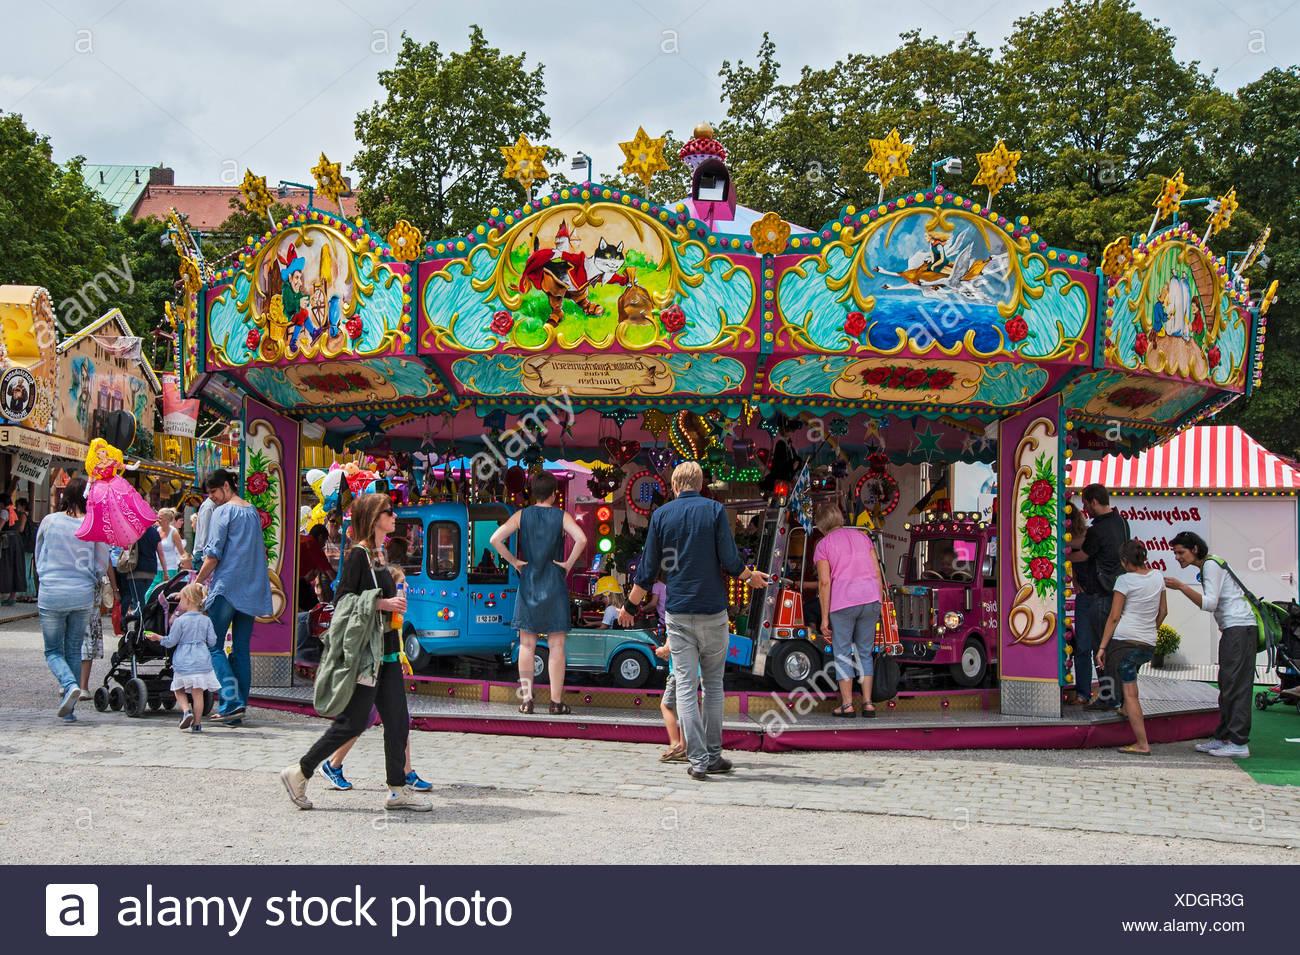 Nostalgic children's carousel, Auer Dult, Munich, Upper Bavaria, Bavaria, Germany - Stock Image